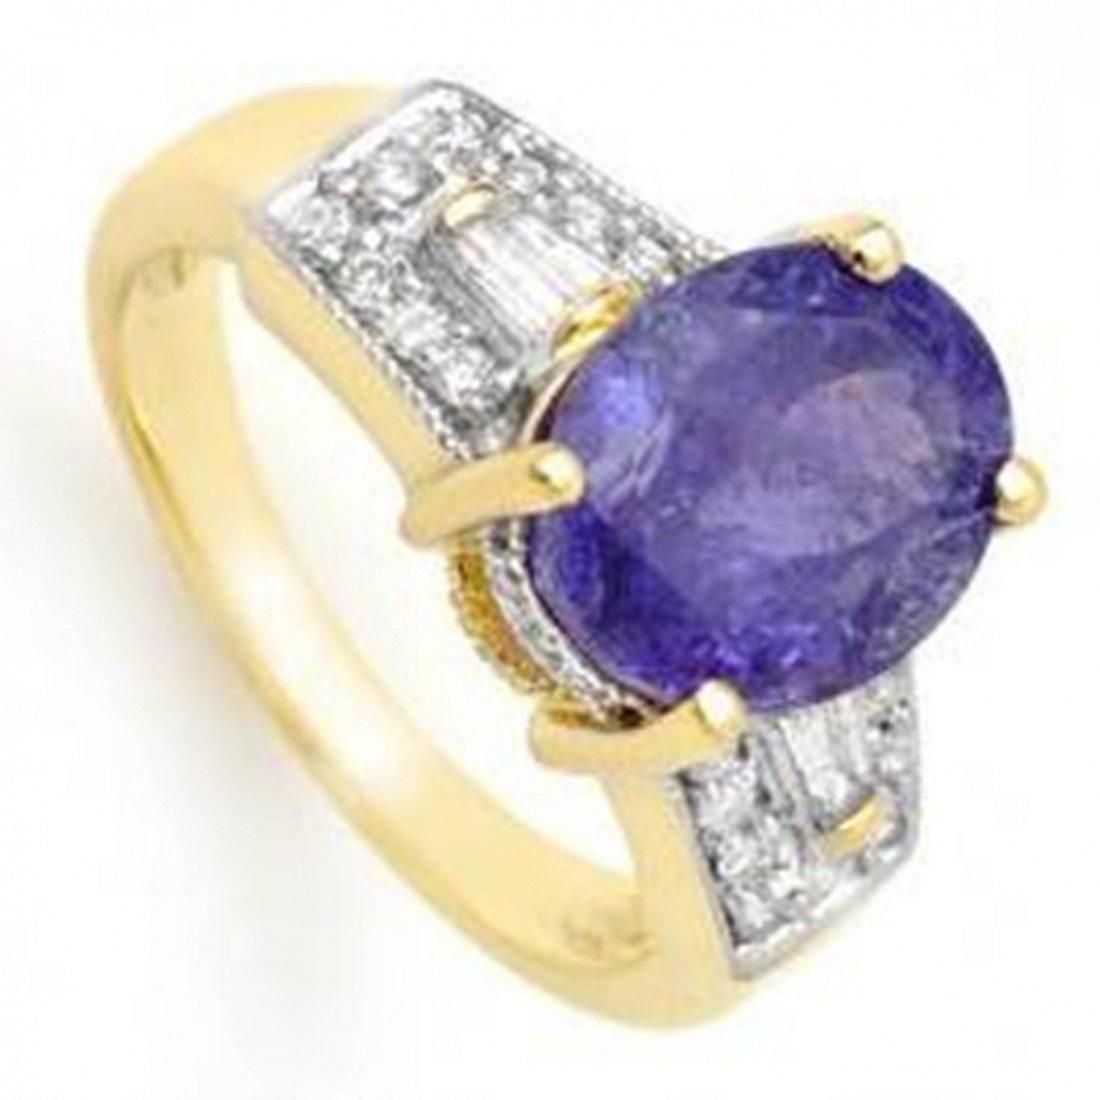 7W: 5.55ctw Tanzanite & Diamond Ring 10K Yellow Gold